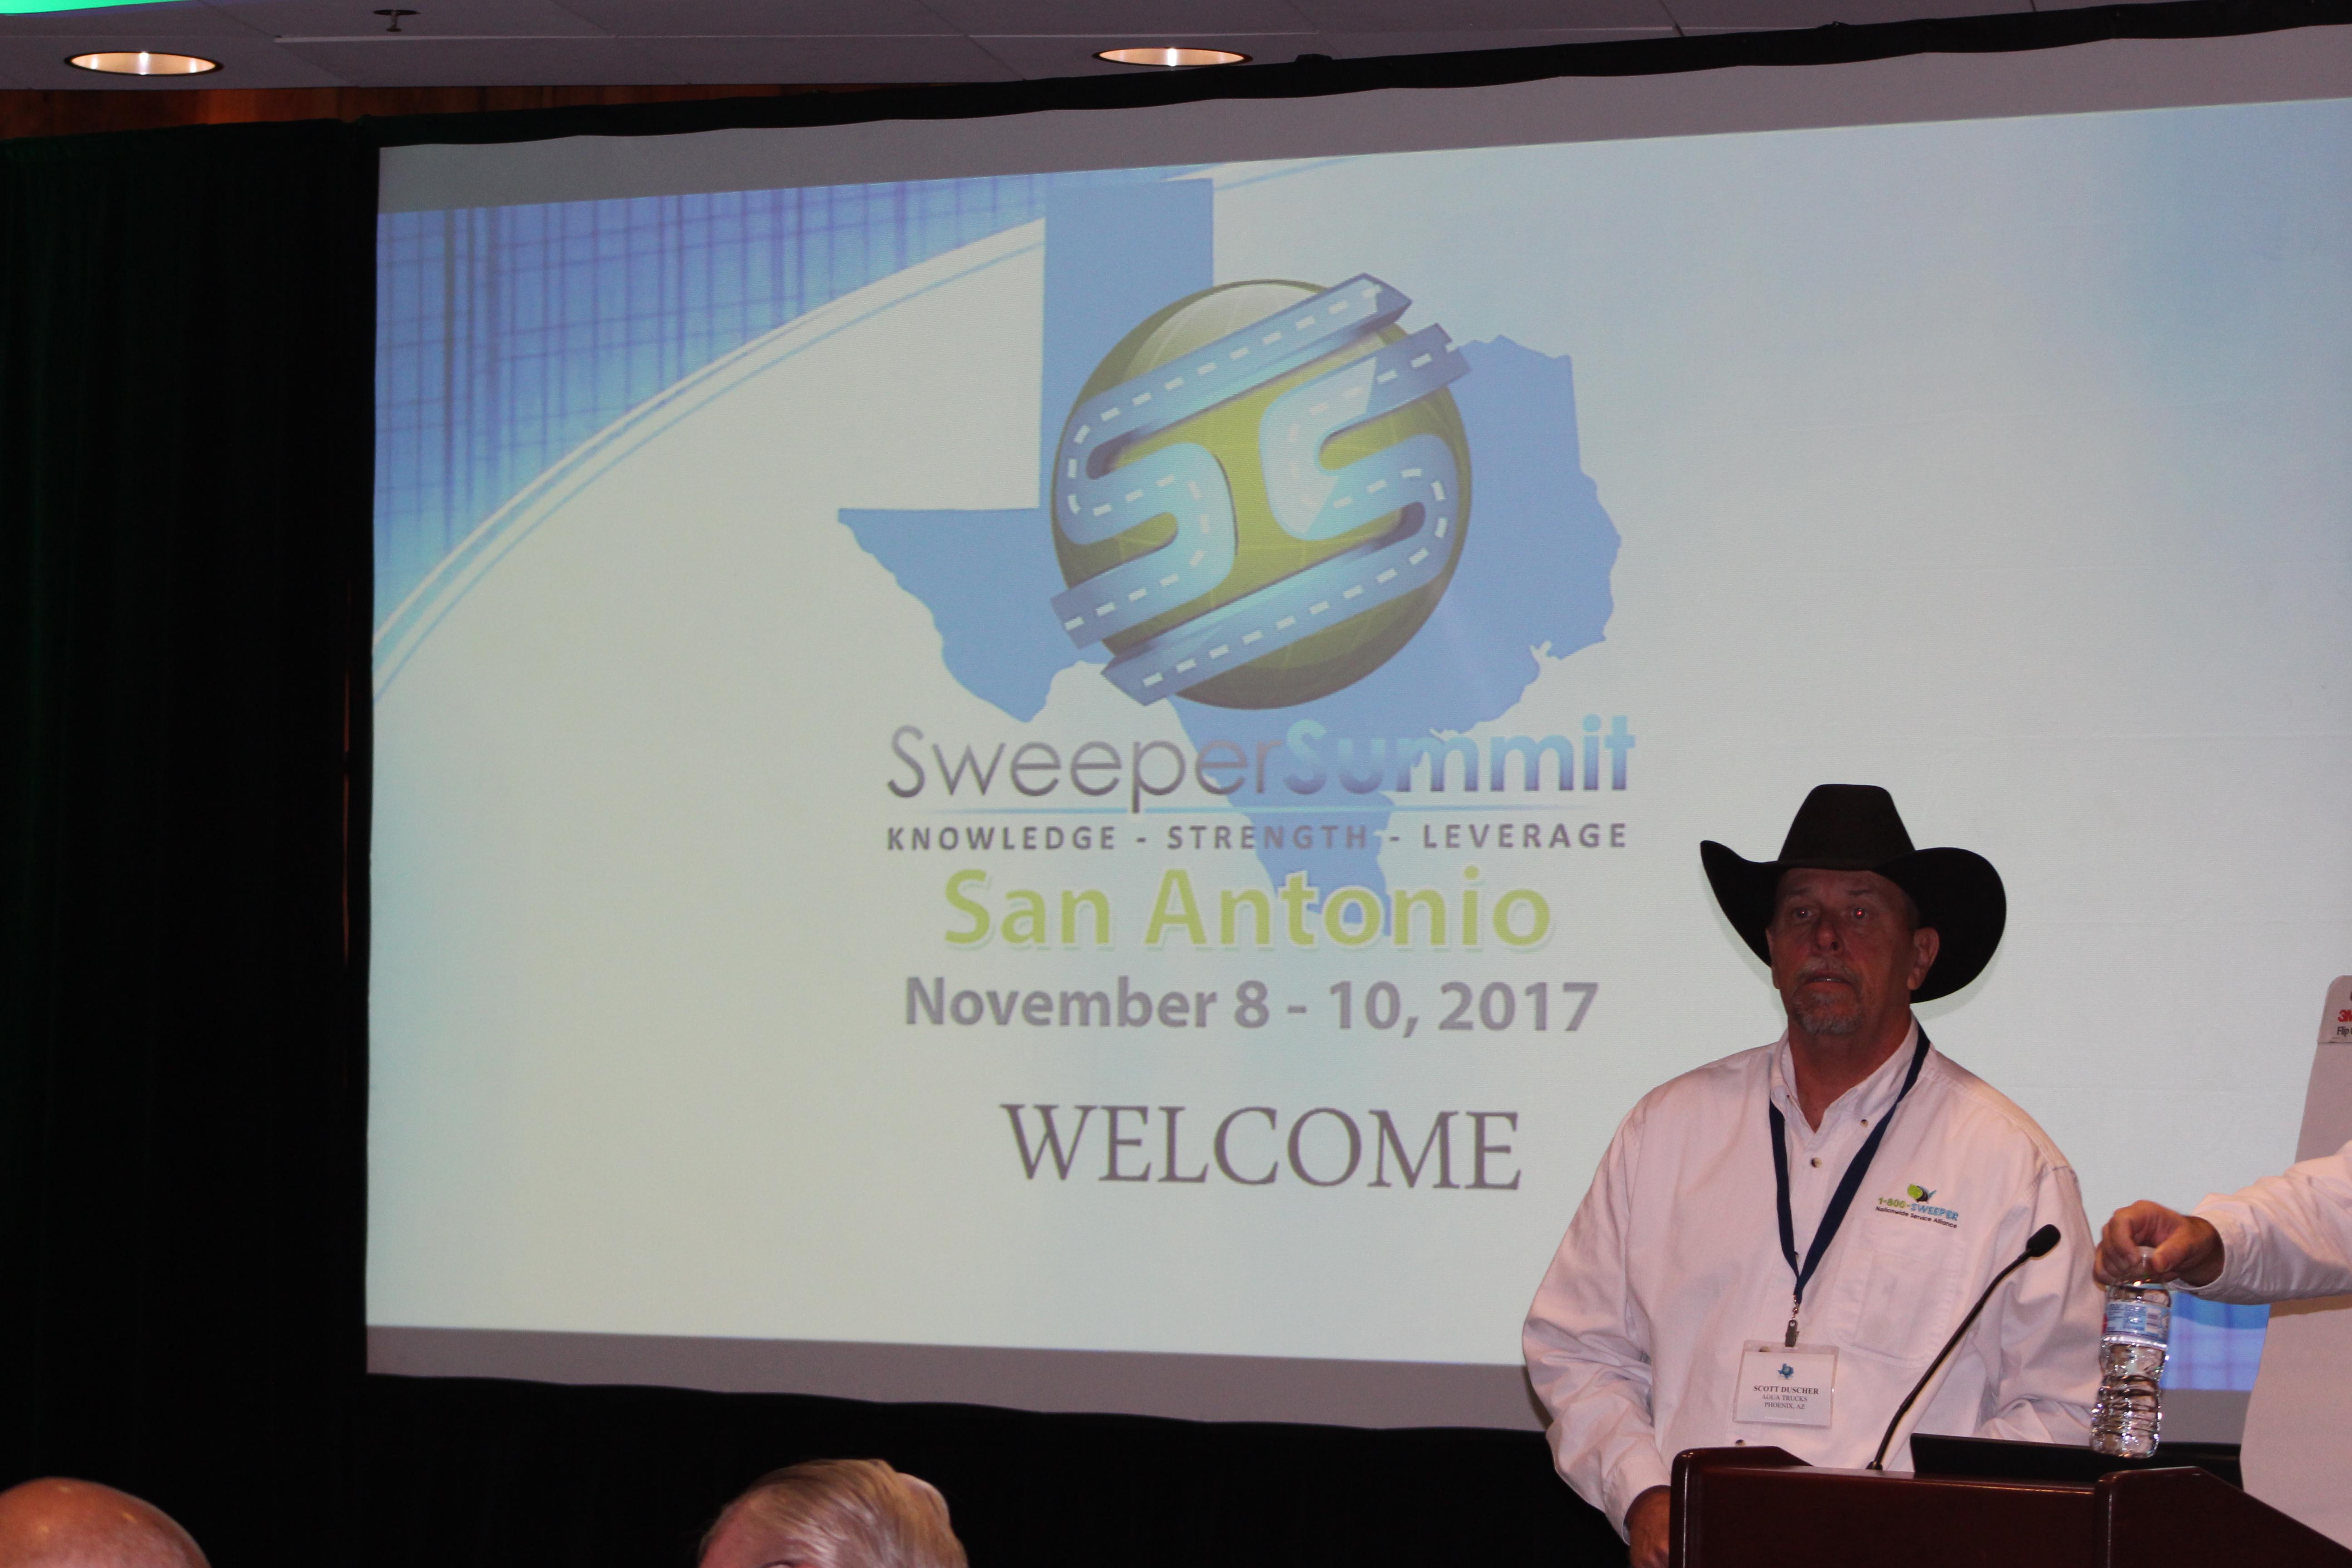 Sweeper Summit 2017